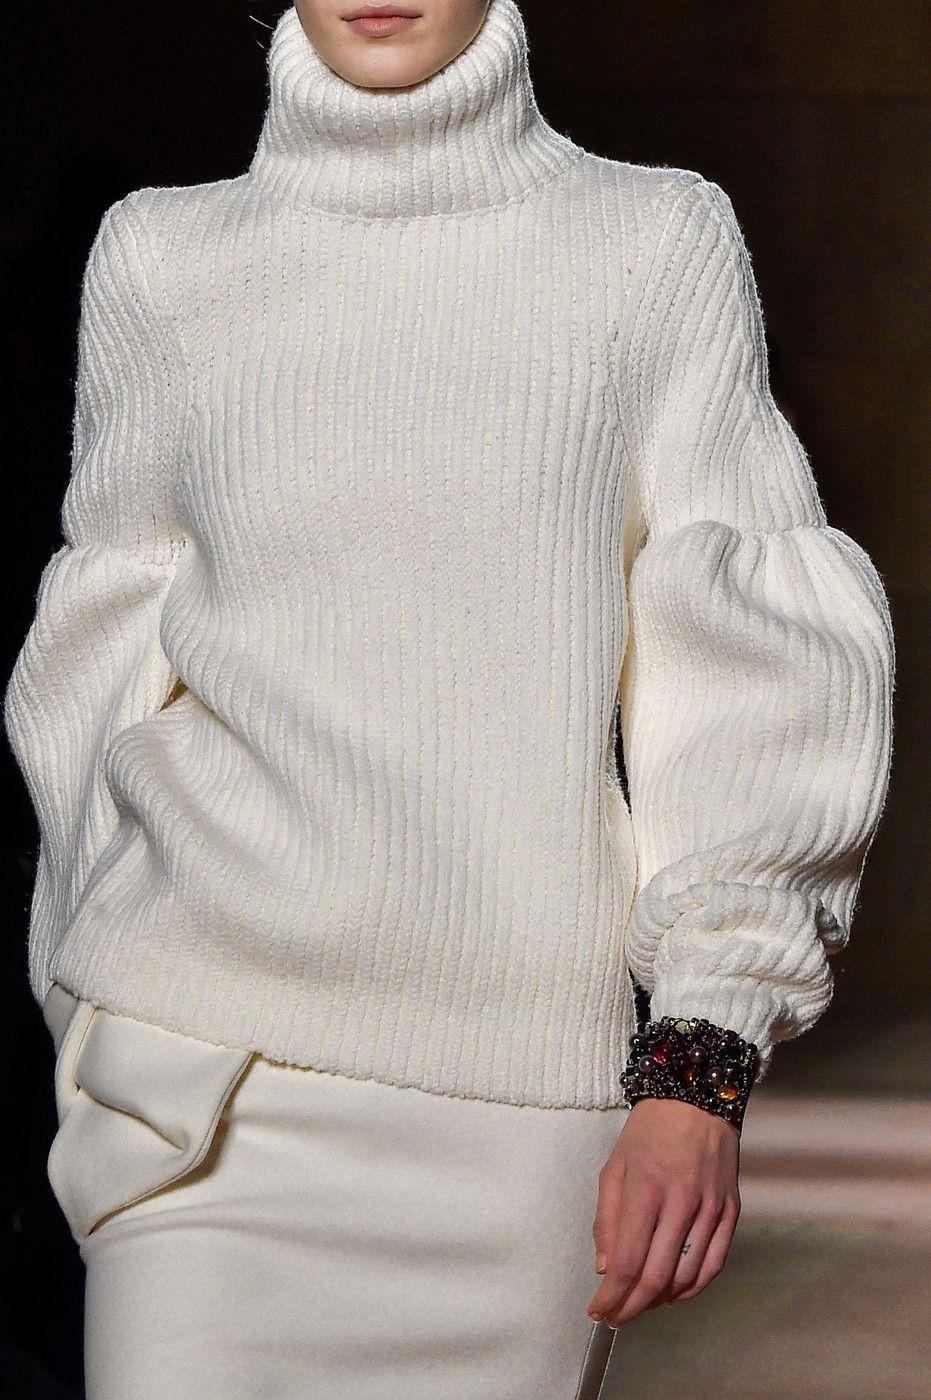 Victoria Beckham at New York Fashion Week Fall 2015 - StyleBistro